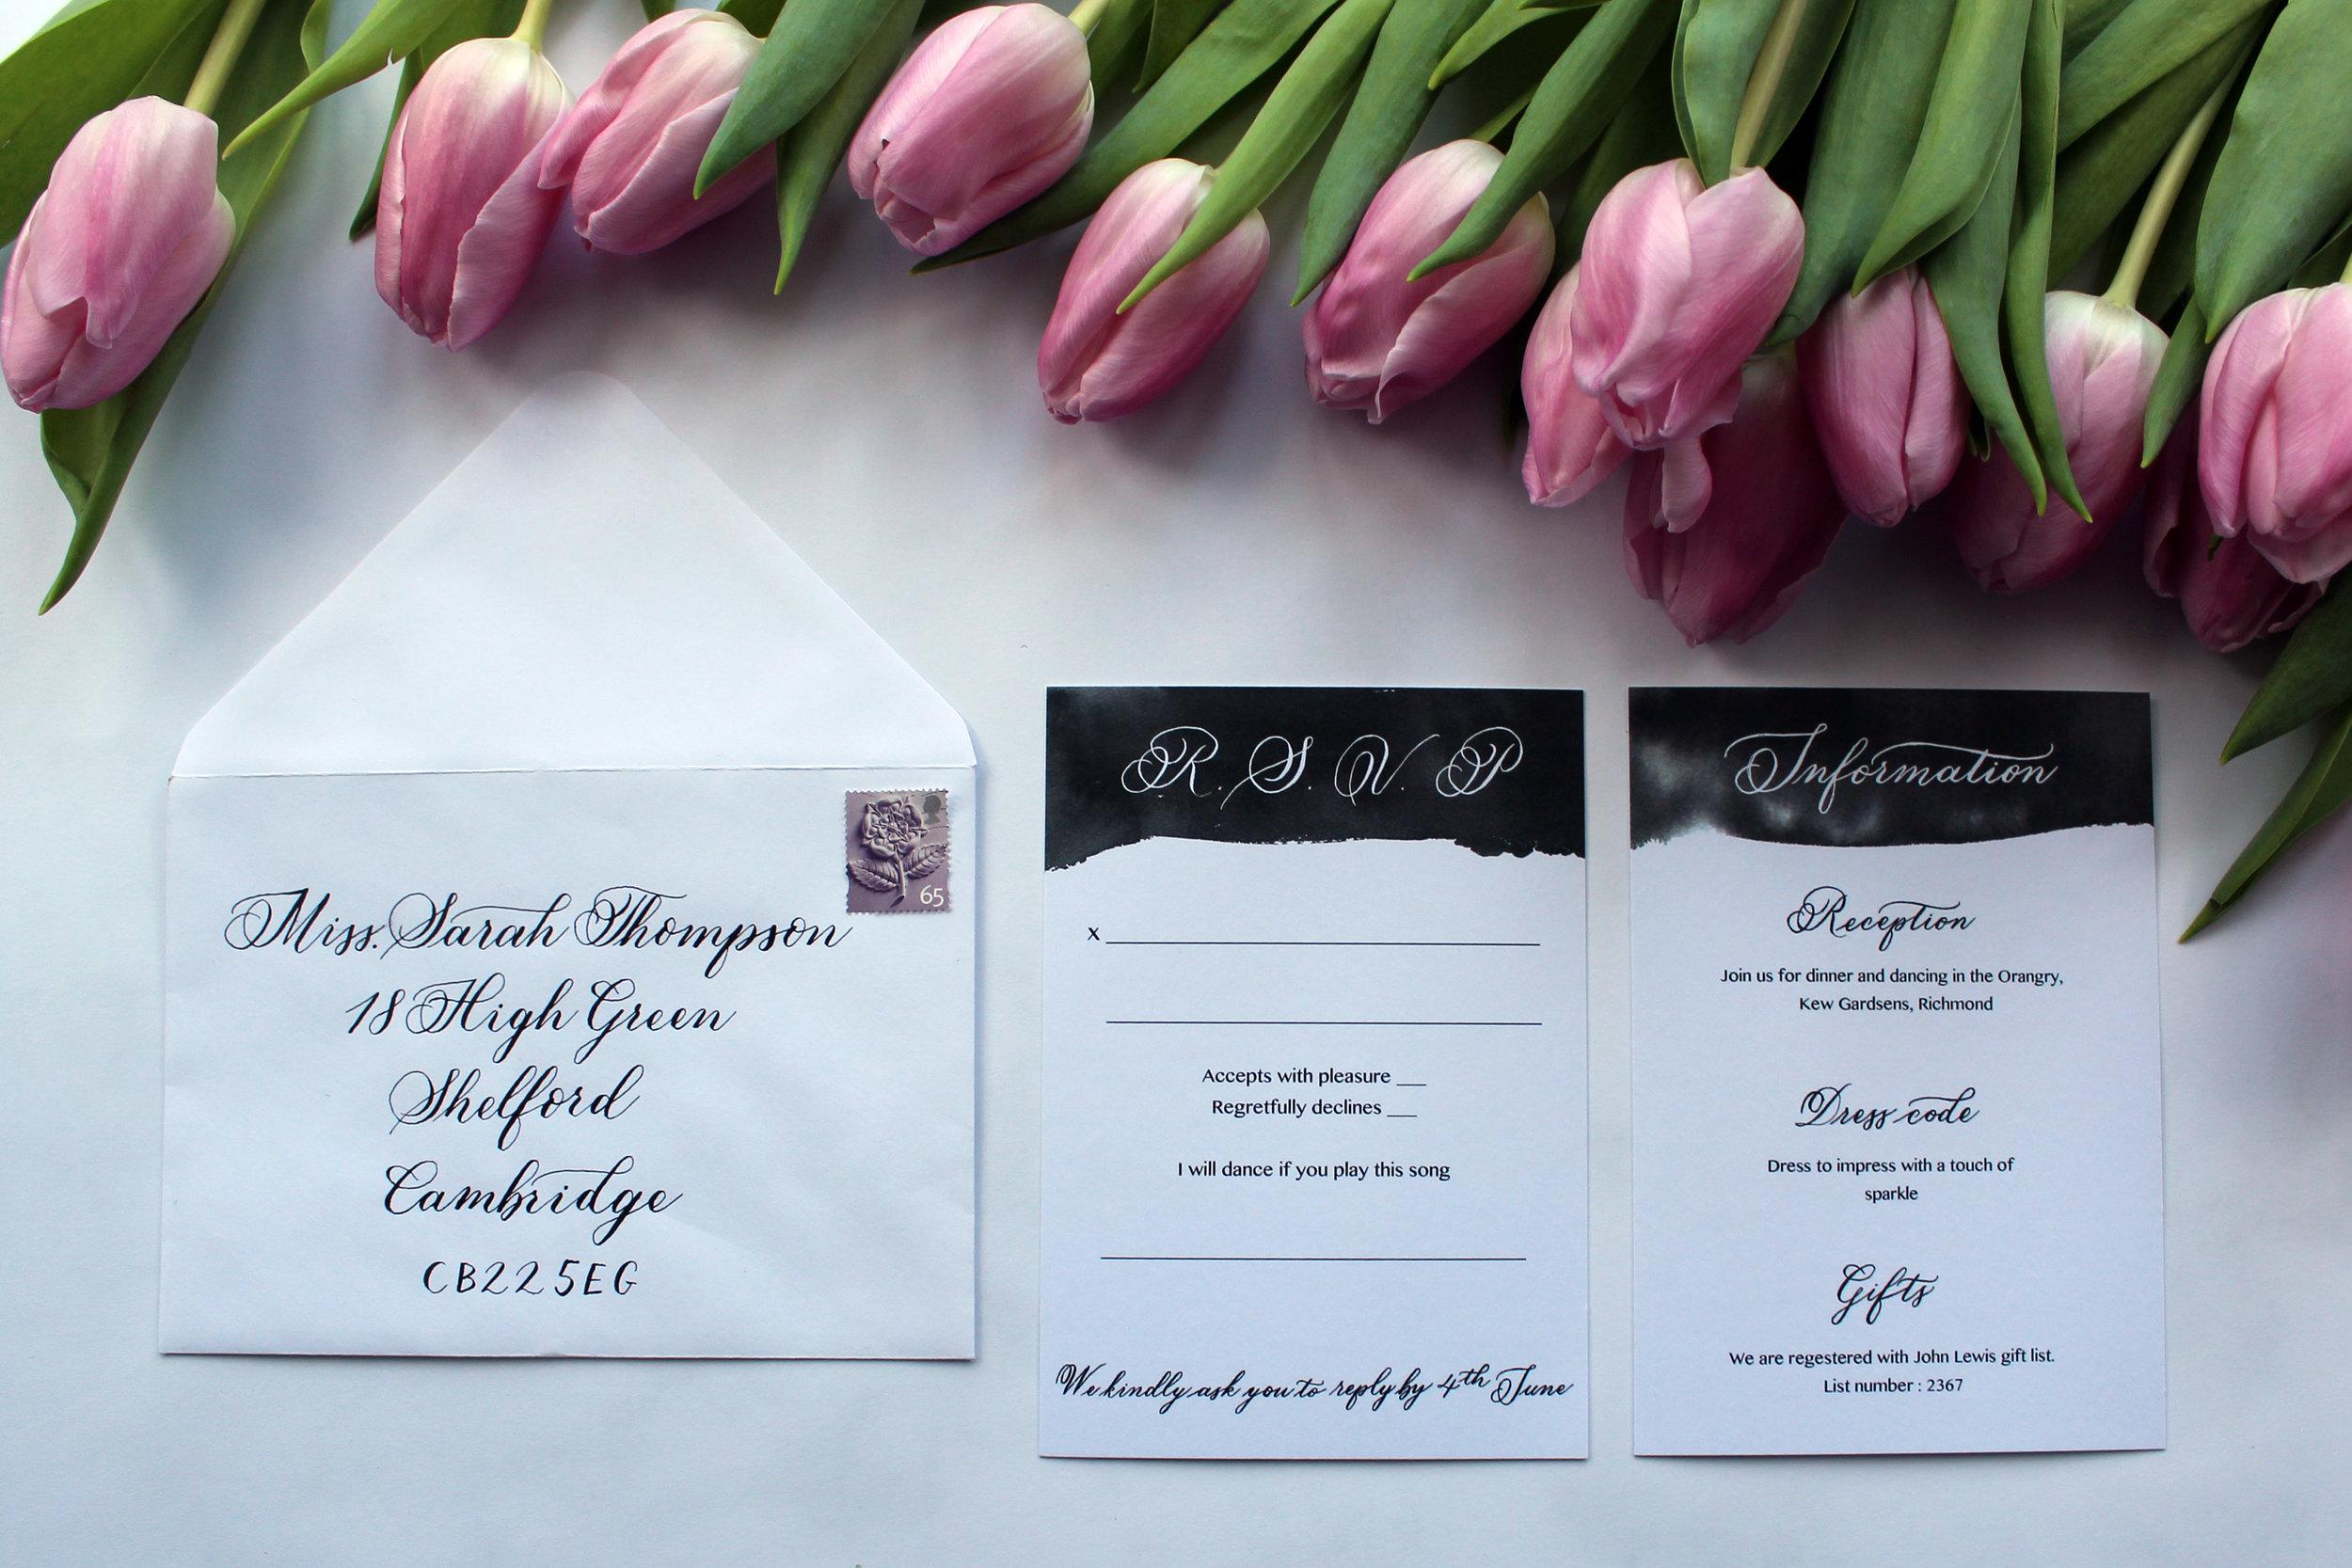 Ik rsvp and calligraphy envelope.jpg